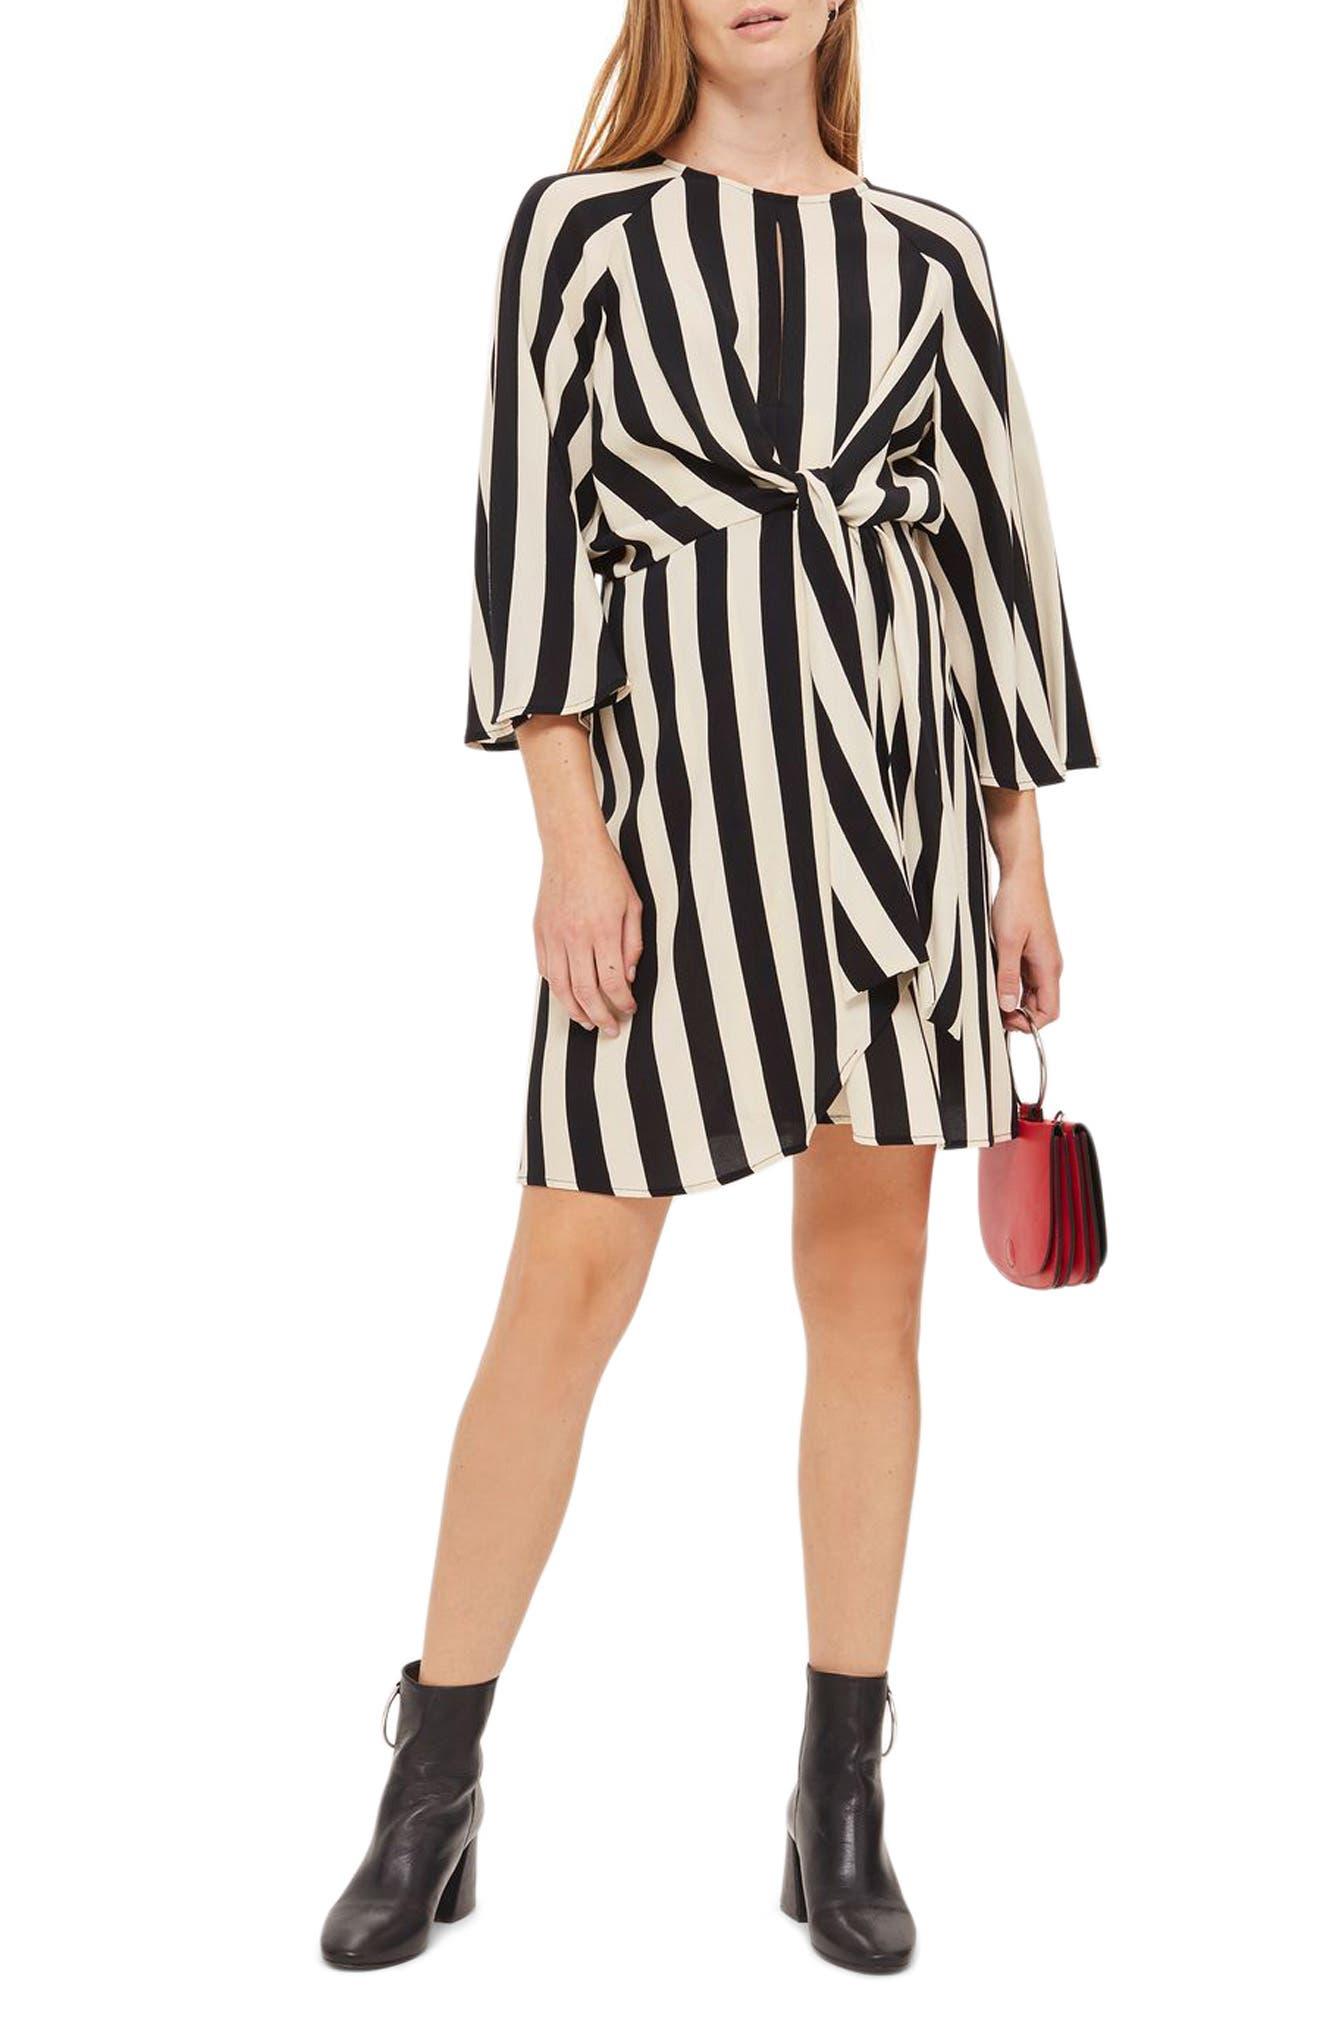 Humbug Stripe Knot Maternity Dress,                         Main,                         color, 900